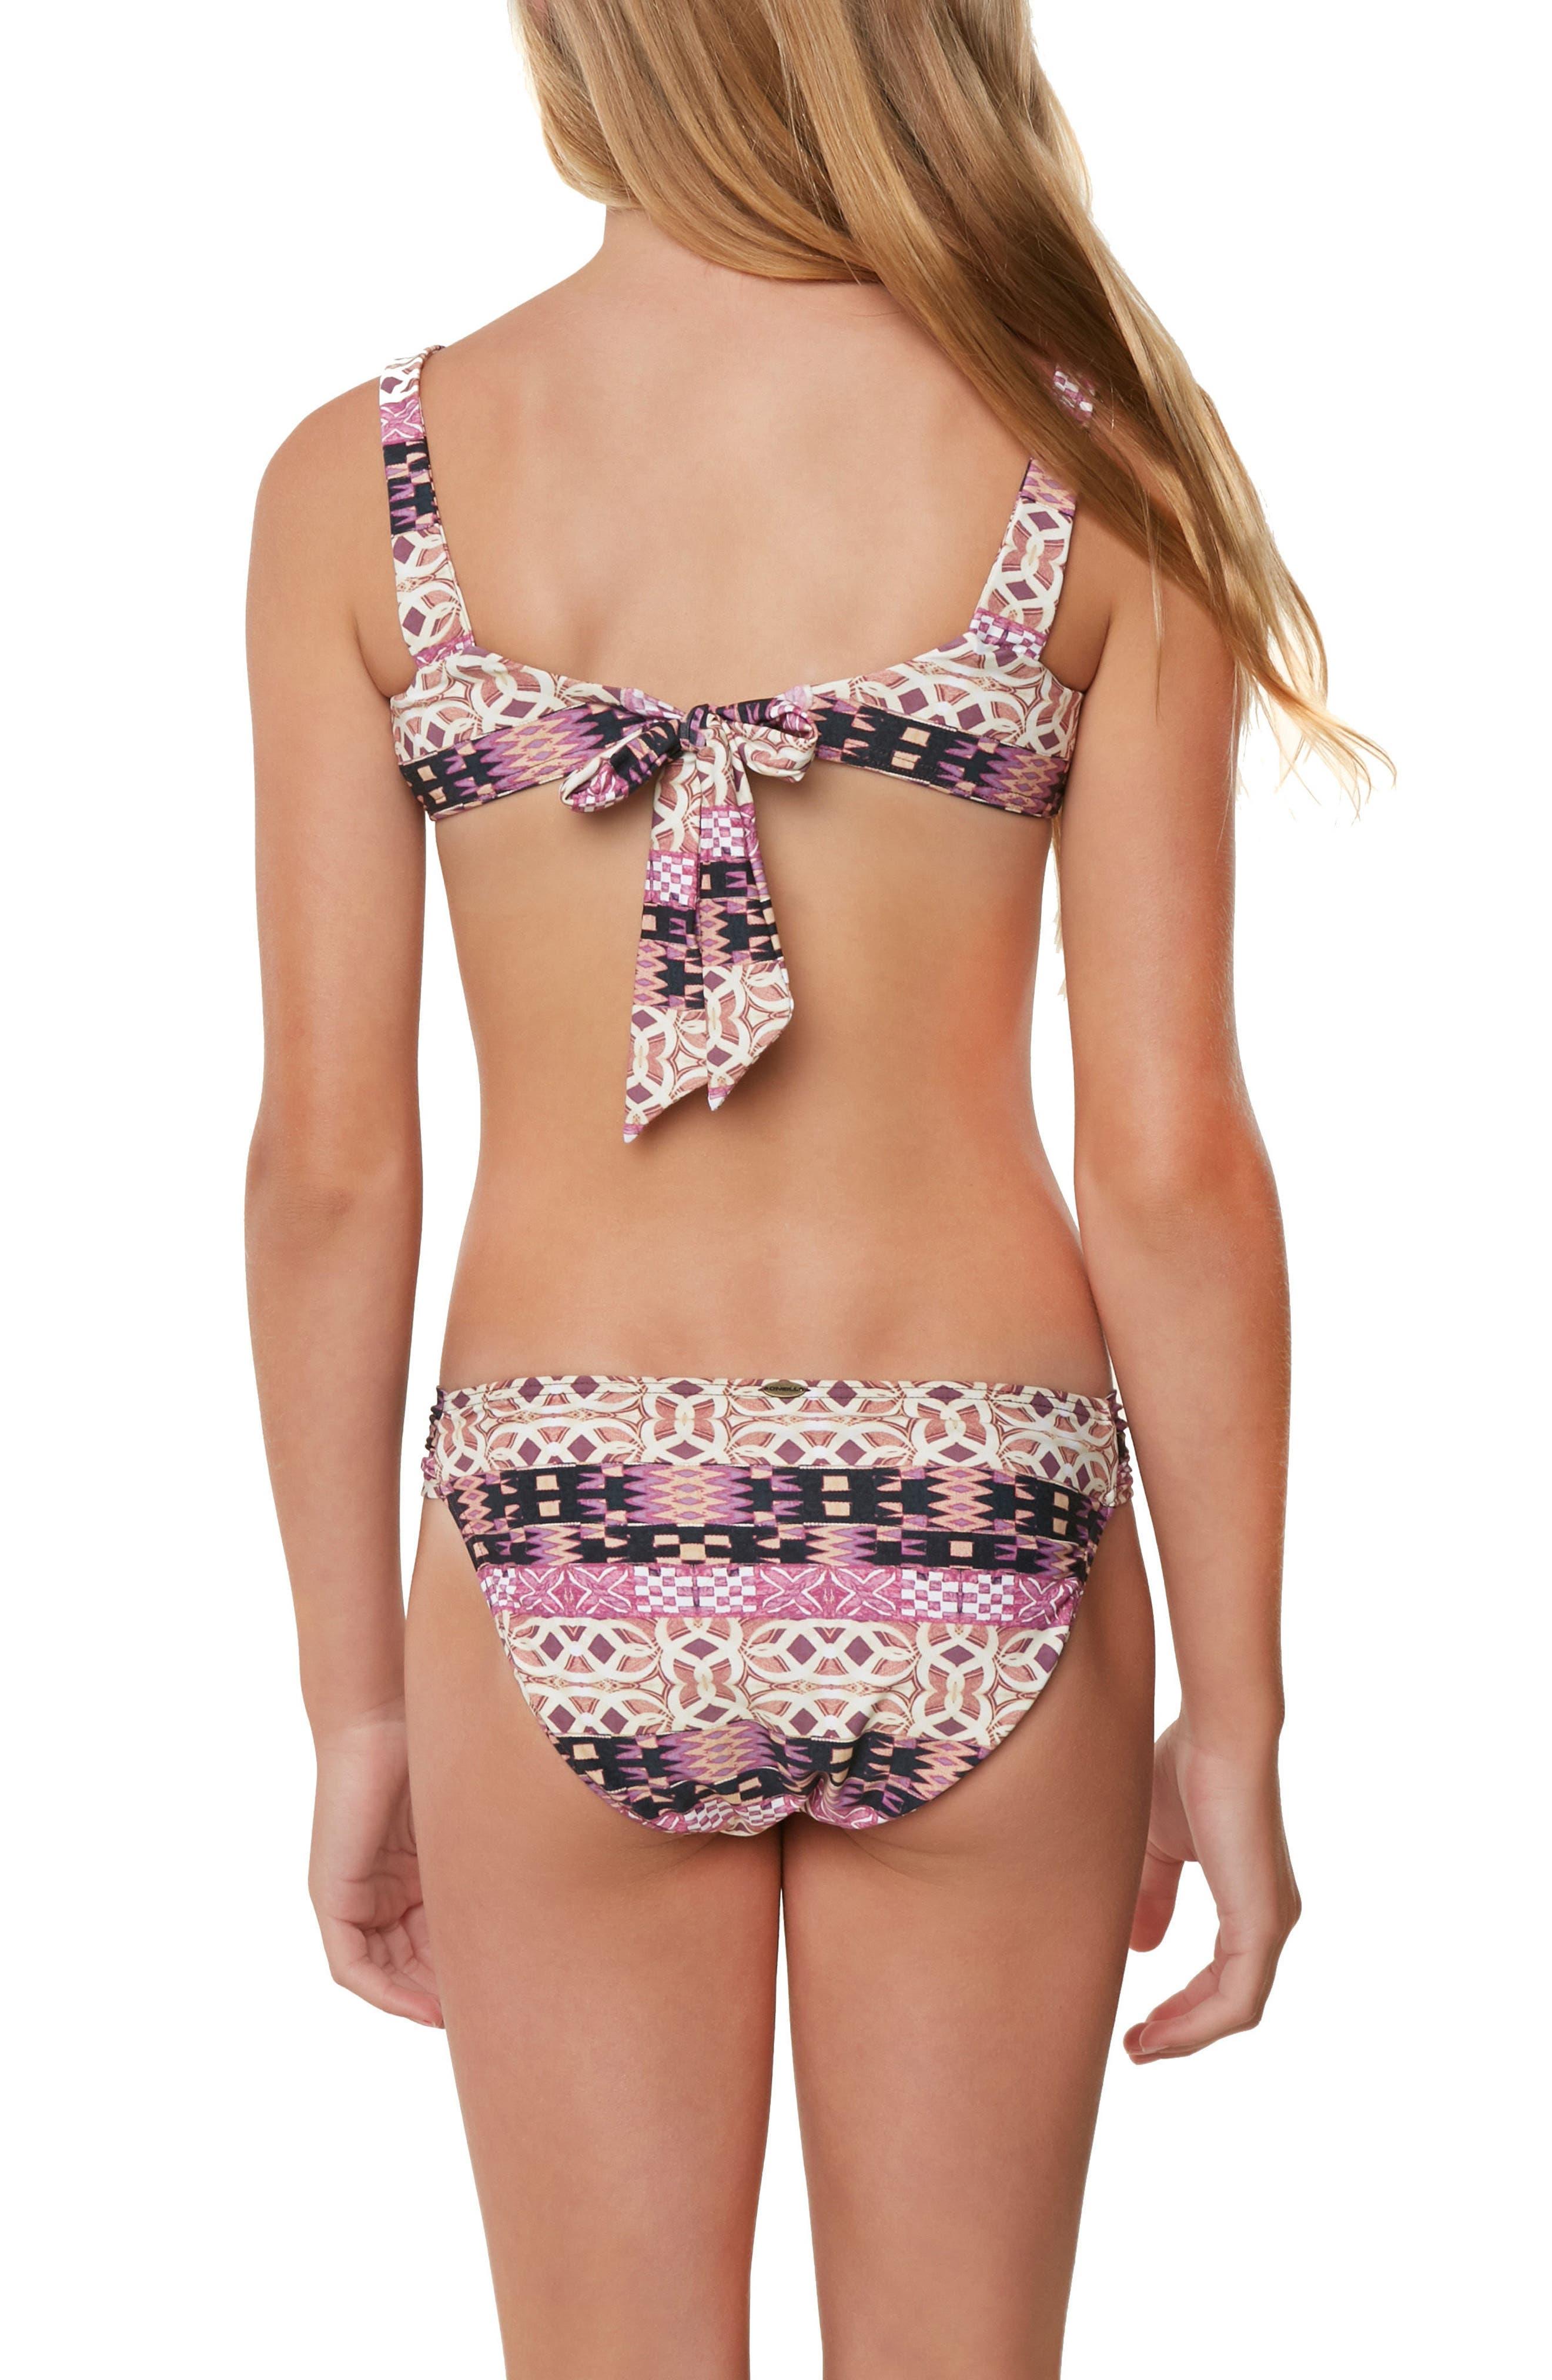 Zanzibar Reversible Two-Piece Swimsuit,                             Alternate thumbnail 4, color,                             500